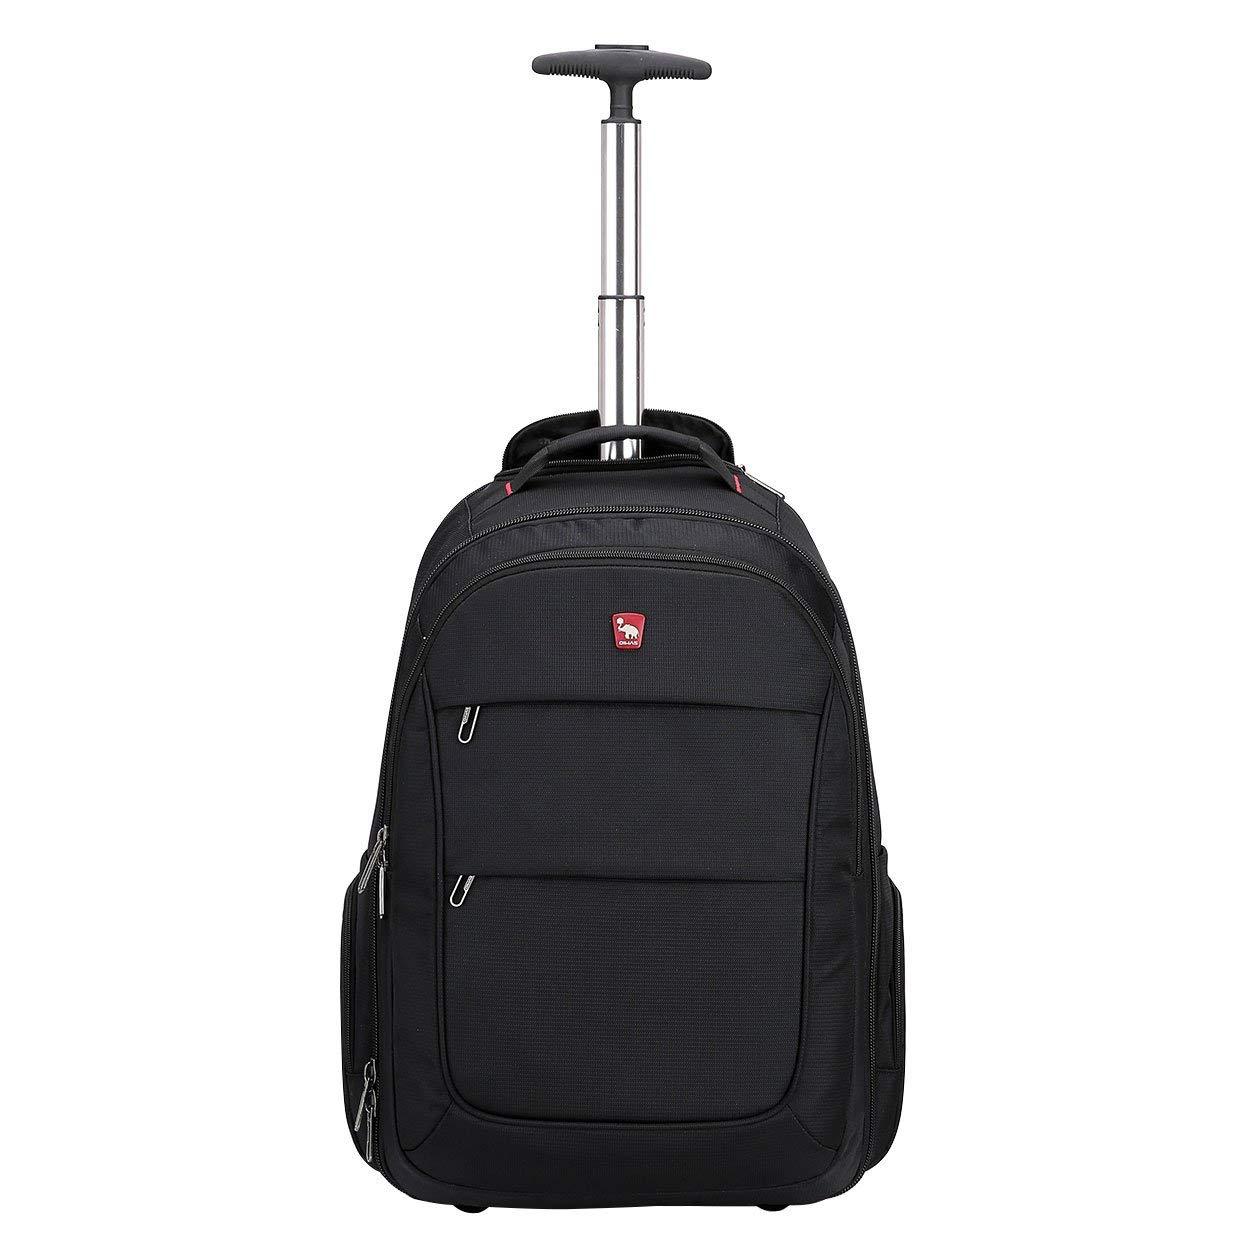 OIWAS Rolling Backpack Book Bag Rucksack